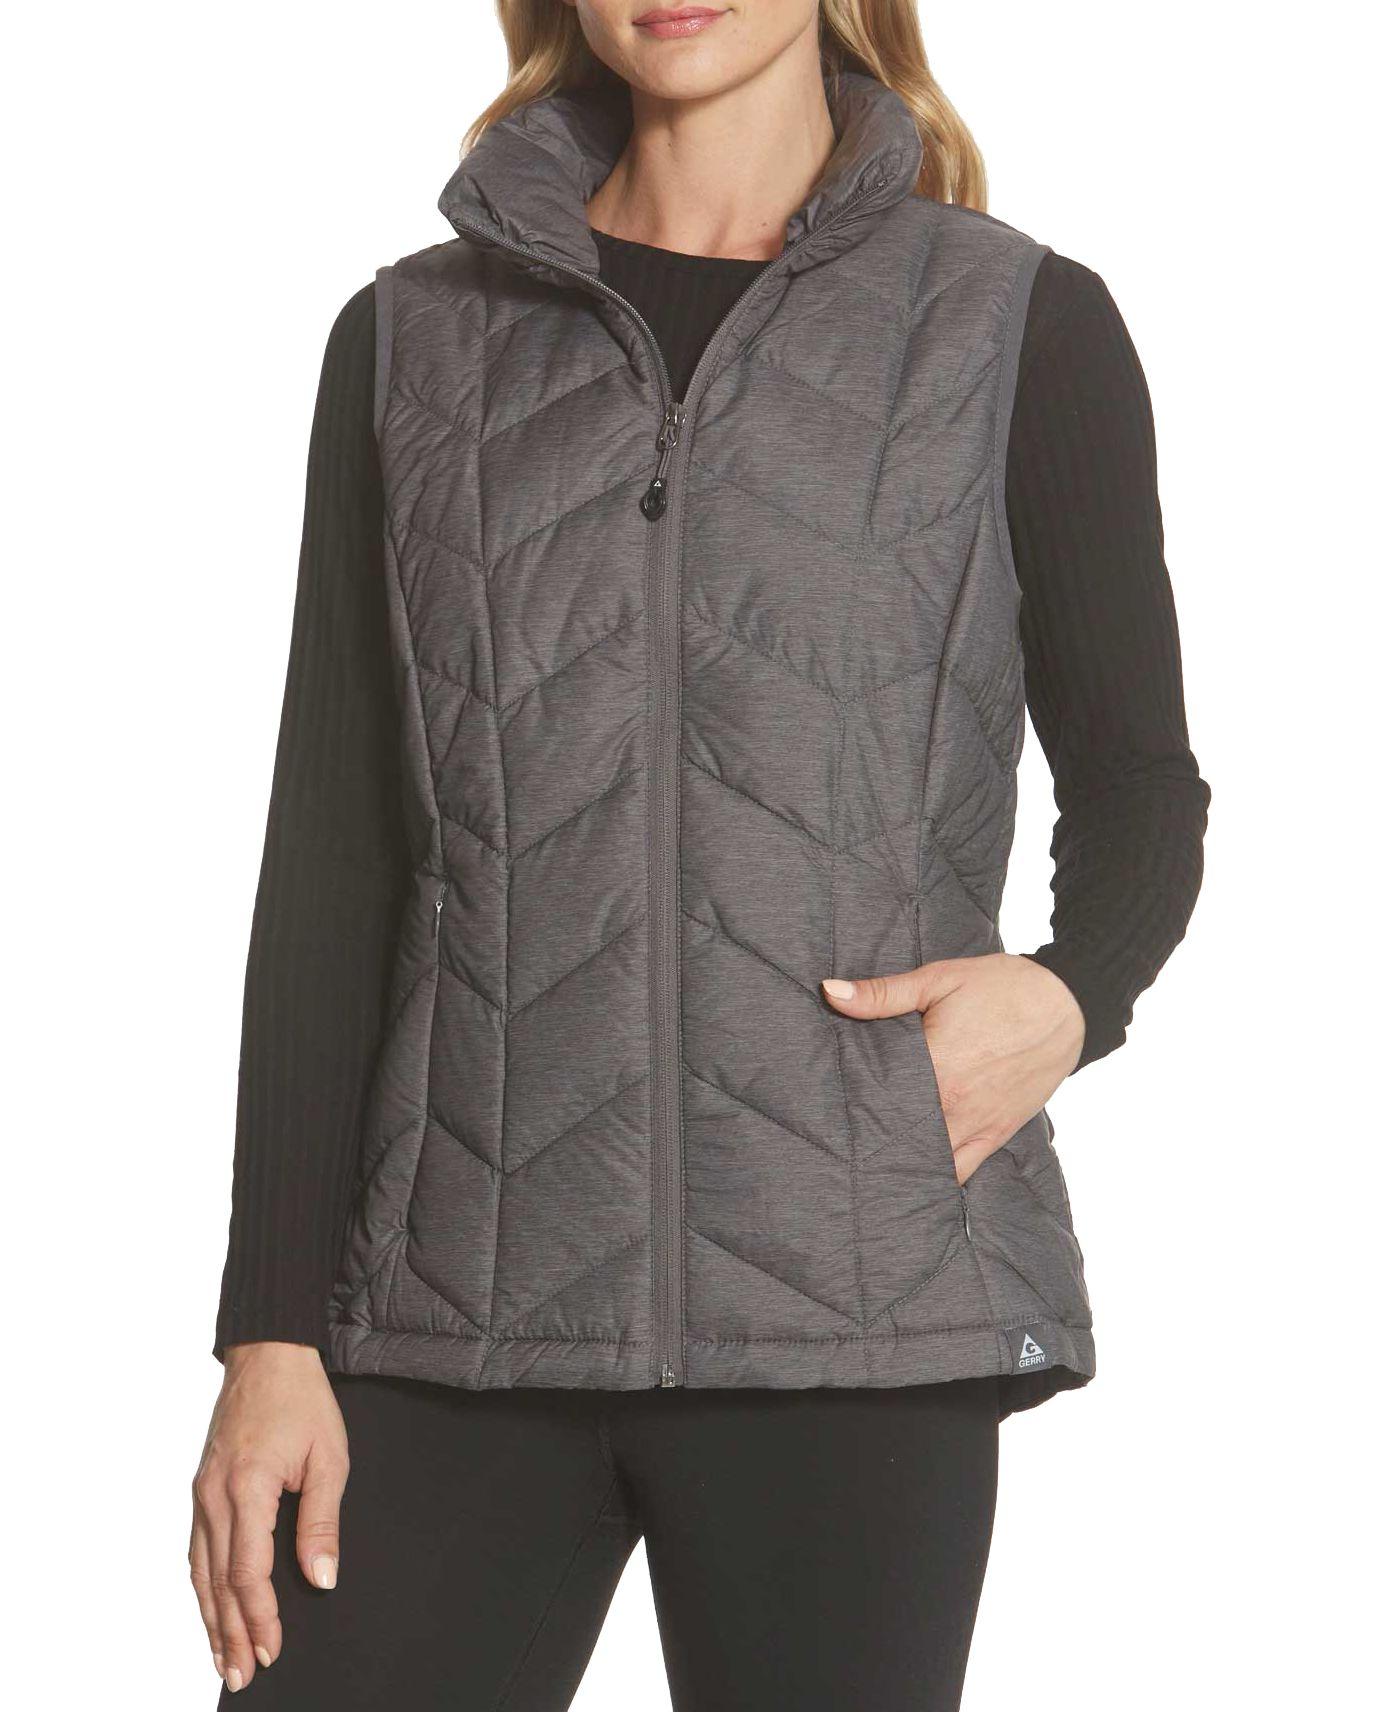 Gerry Women's Brooke Sweater Down Vest